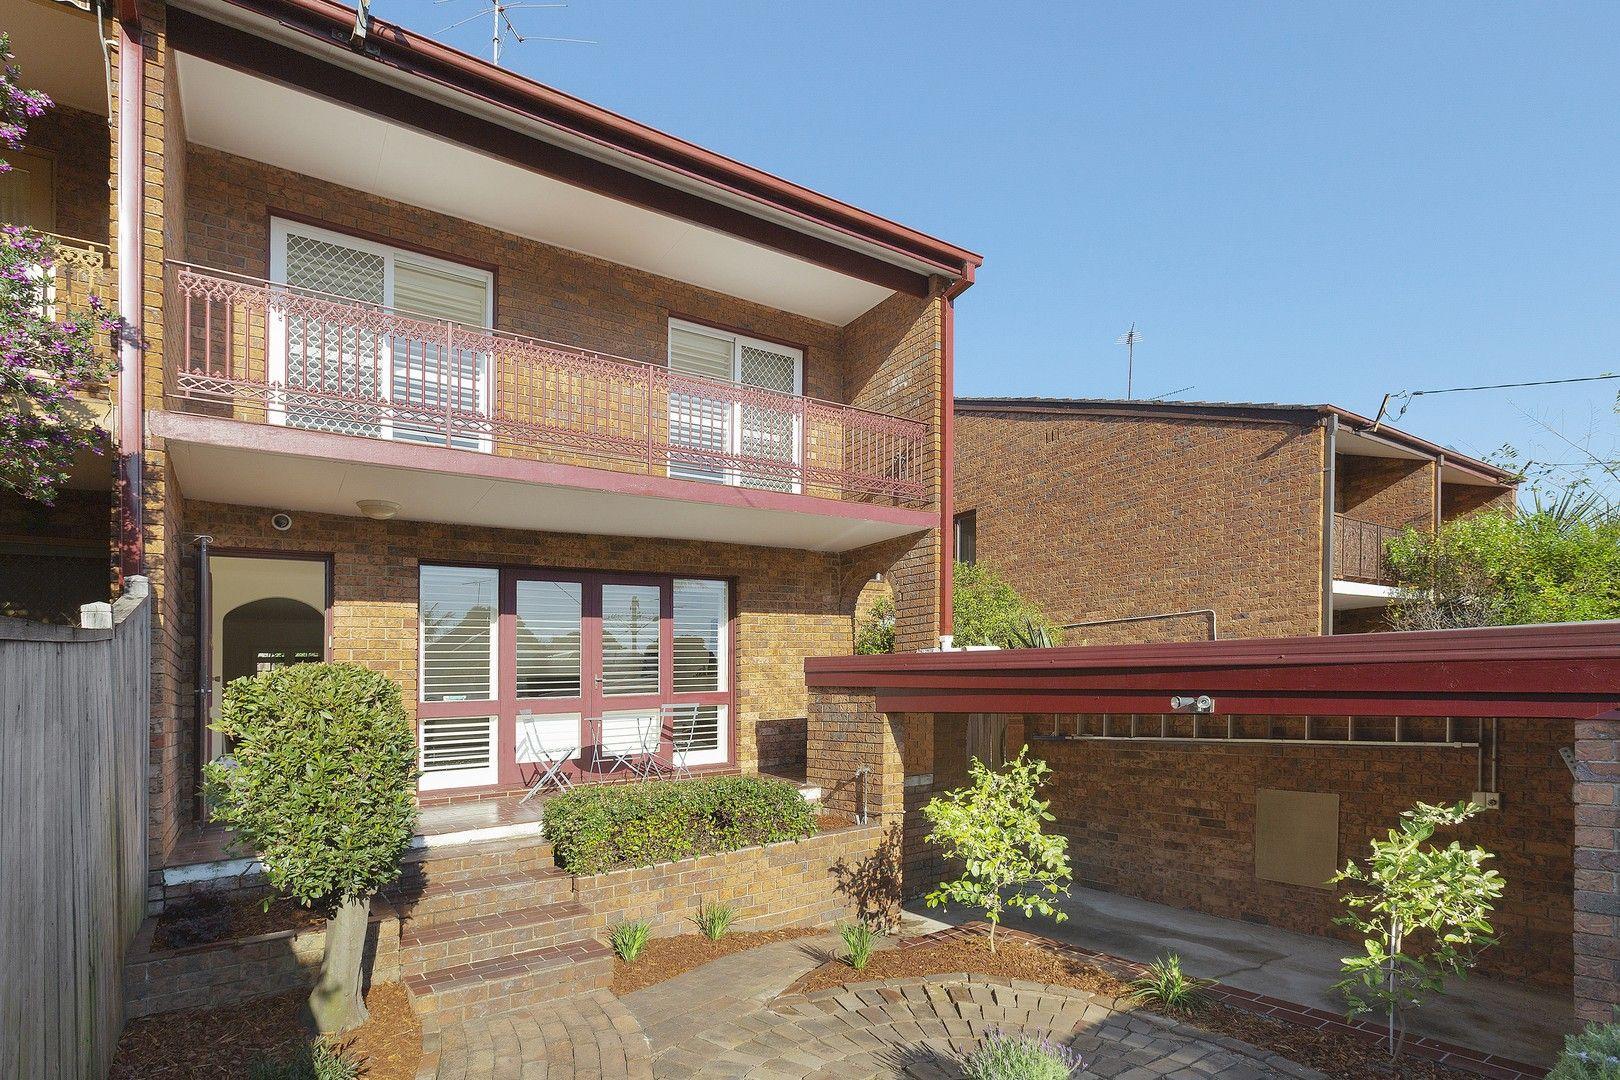 4 bedrooms House in 124 Ruthven Street BONDI JUNCTION NSW, 2022